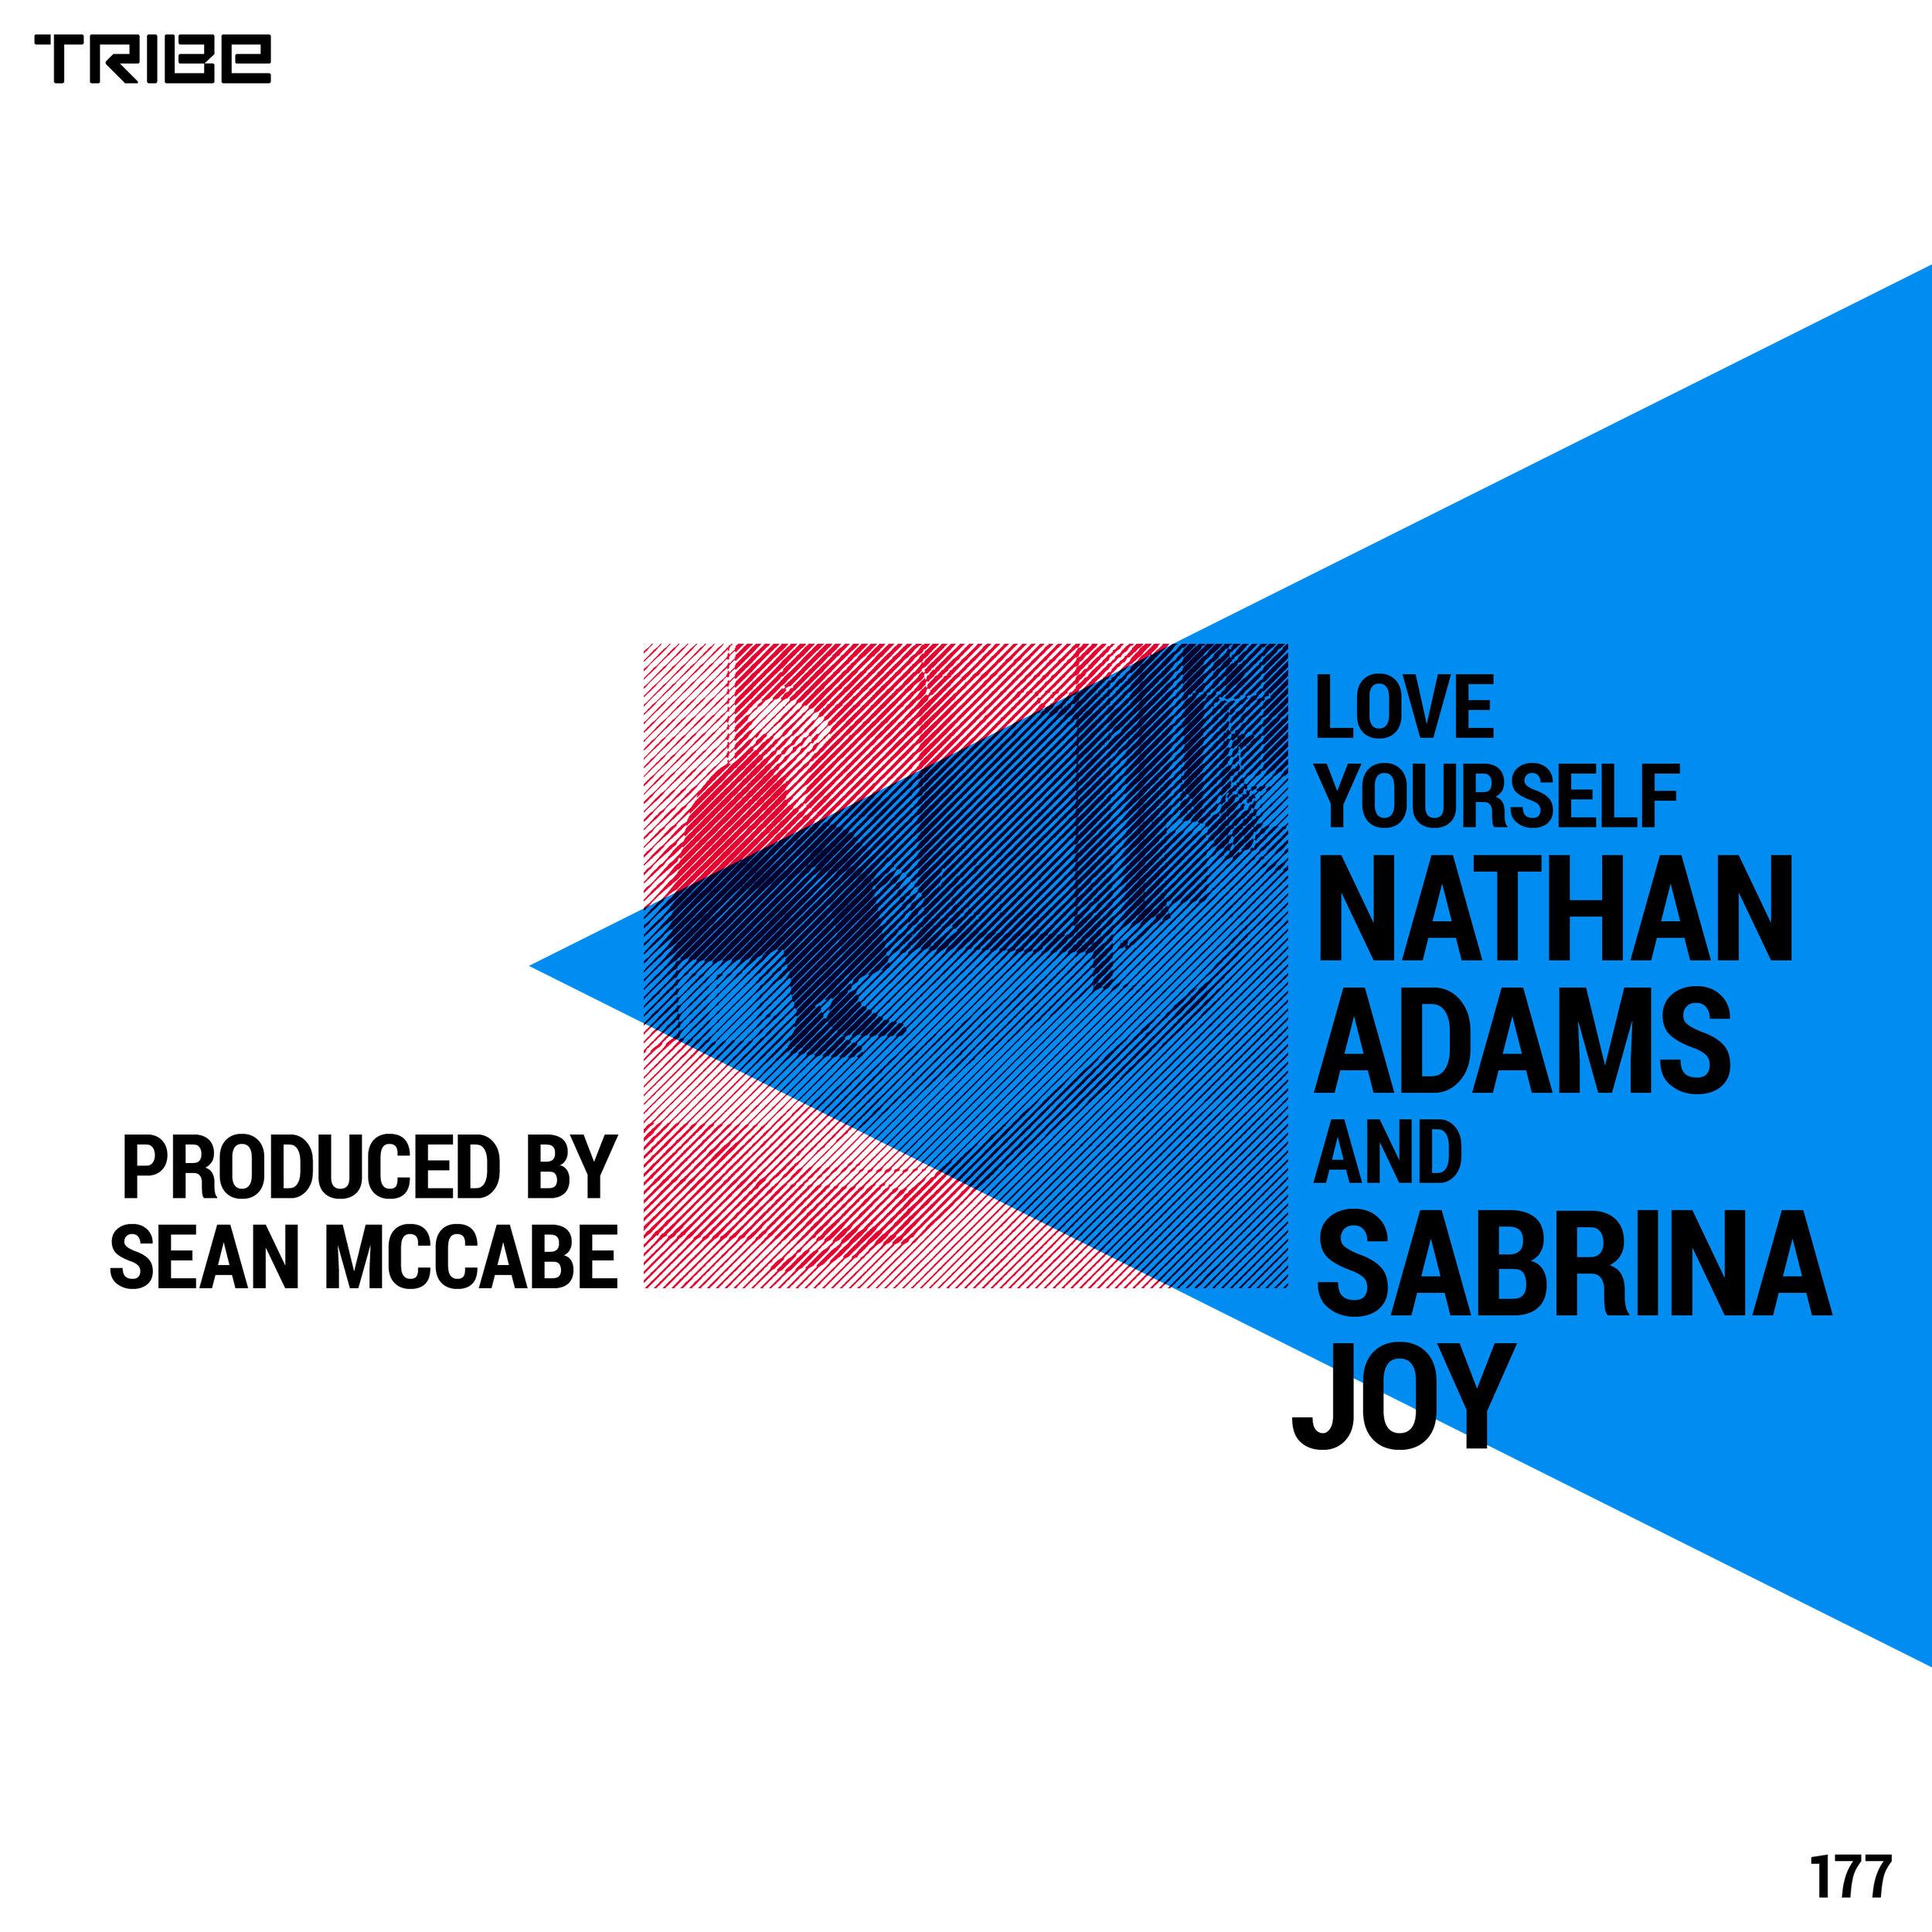 NATHAN ADAMS AND SABRINA JOY LOVE YOURSELF